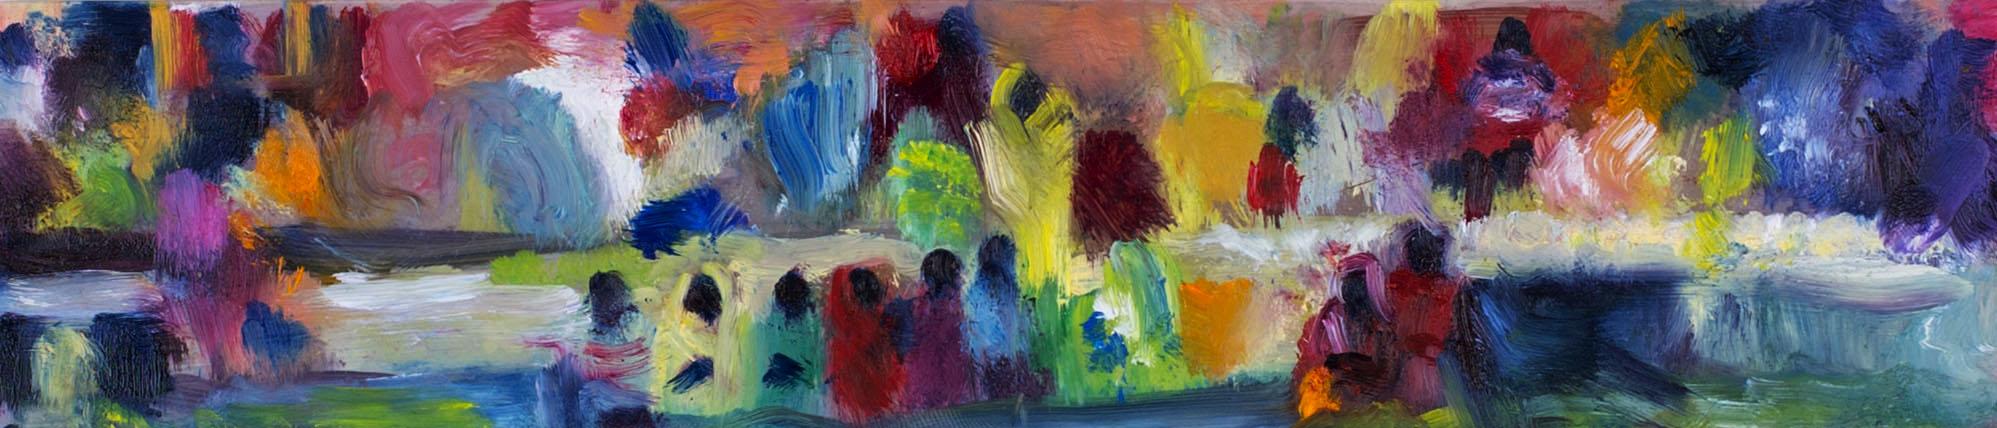 "Medium:  Oil Paint on Mylar   Dimensions:  8½""x2½"""